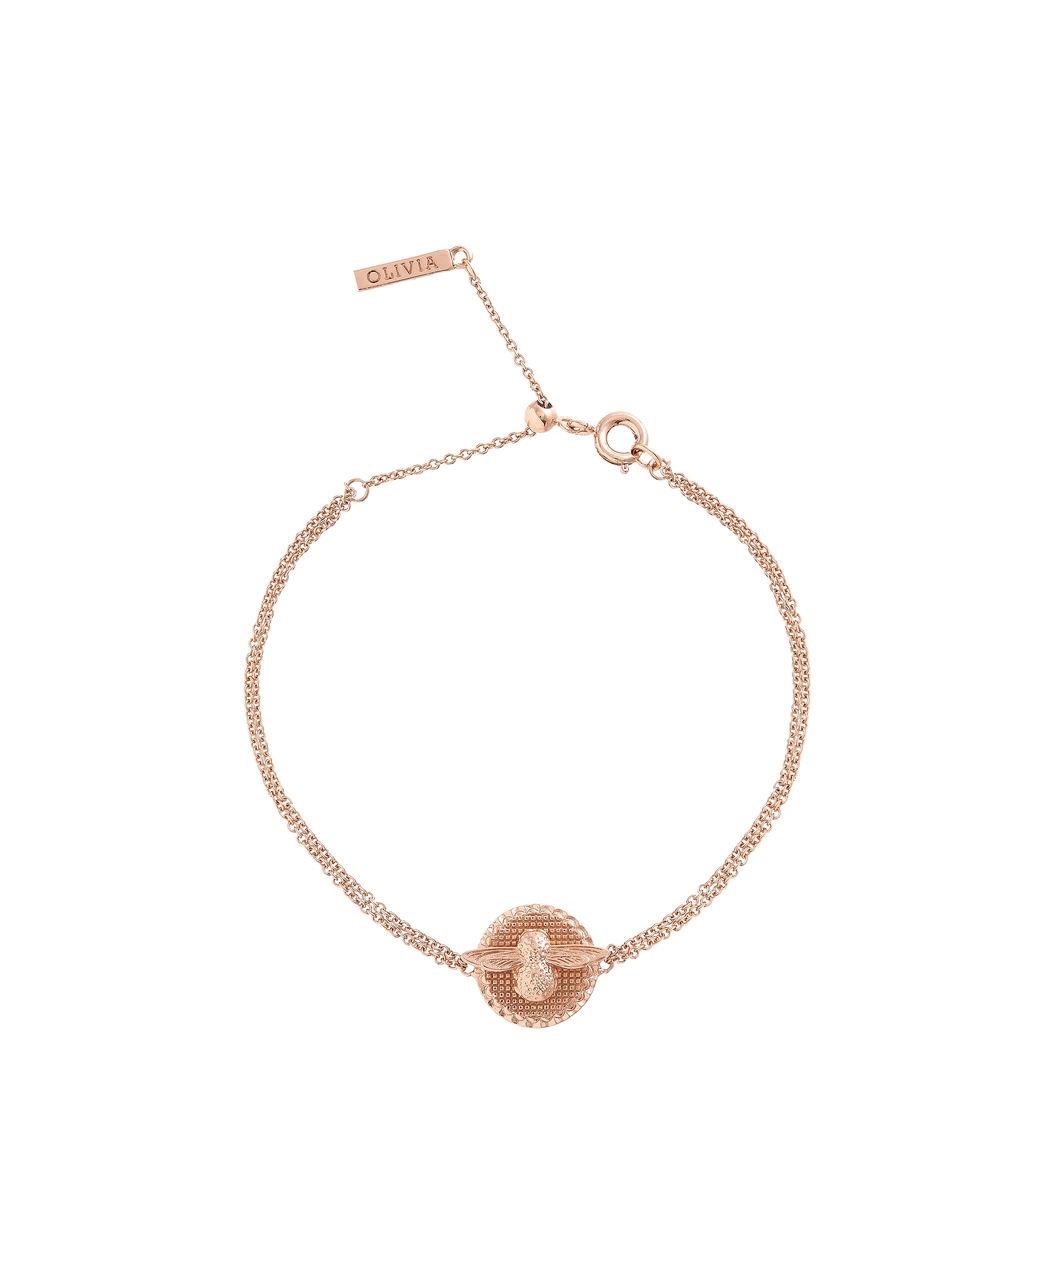 Olivia Burton Bee Coin Chain Bracelet Rose Gold